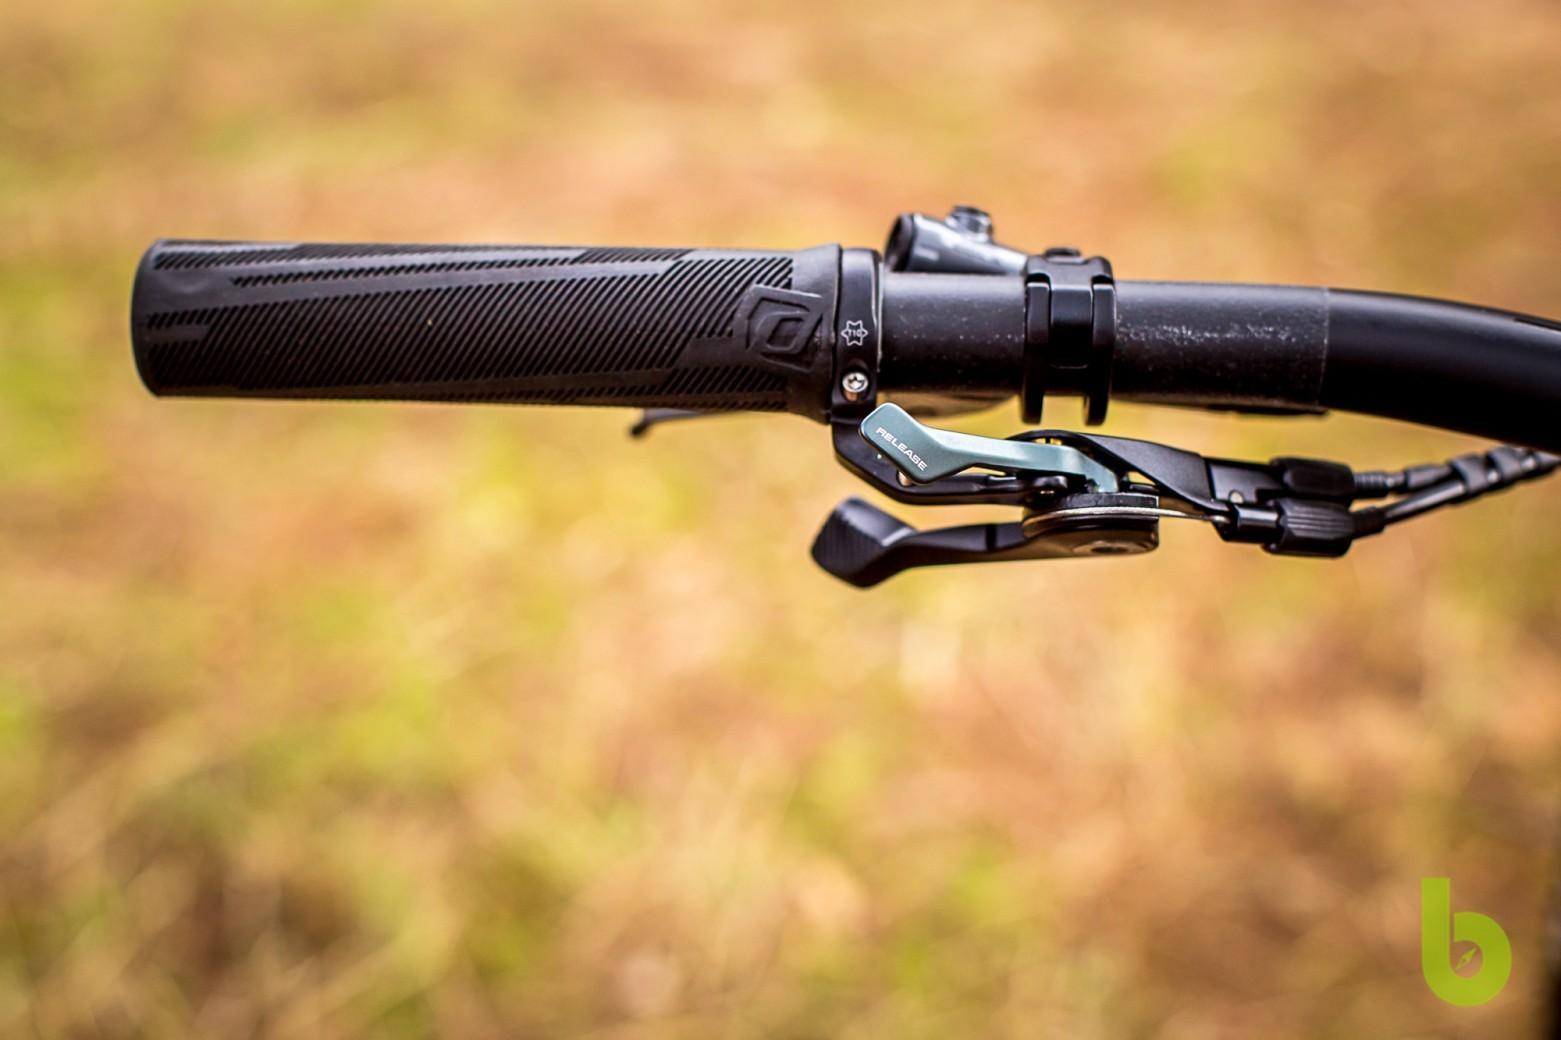 ajustar-suspension-mountain-bike/